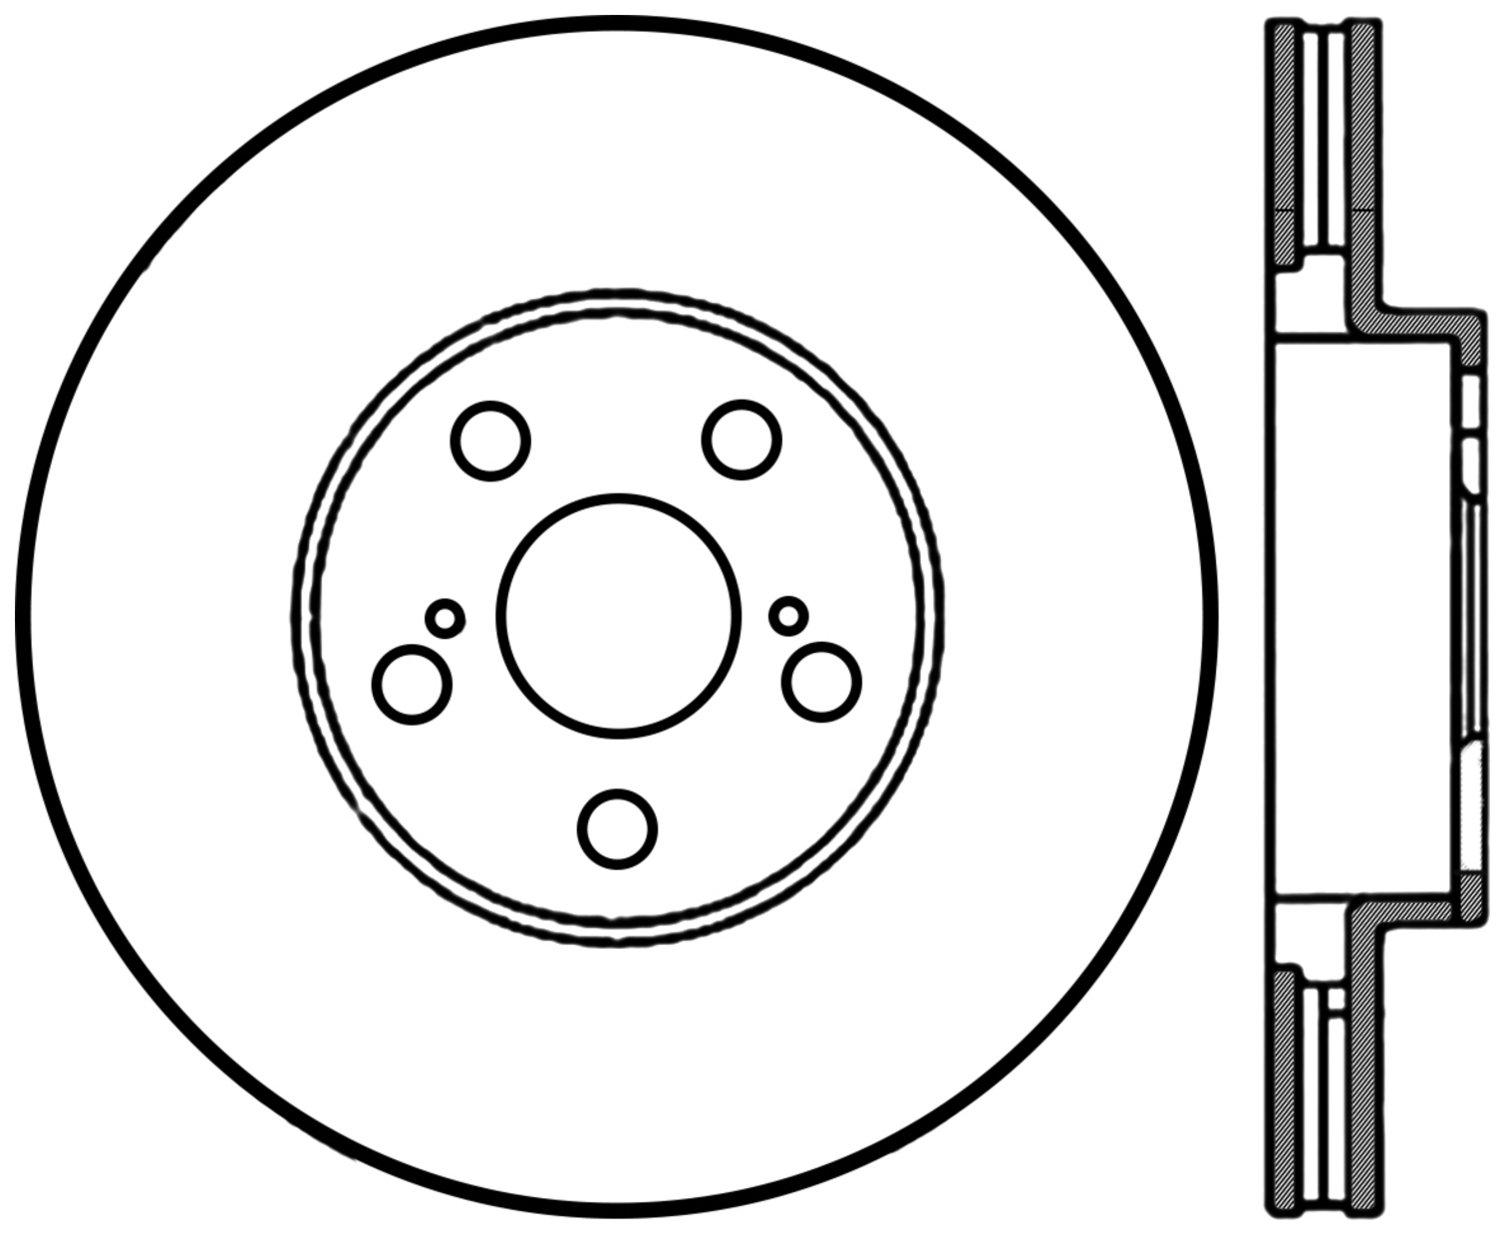 2007 Pontiac Vibe Disc Brake Rotor Wave Wiring Diagram Ce 12044114cry